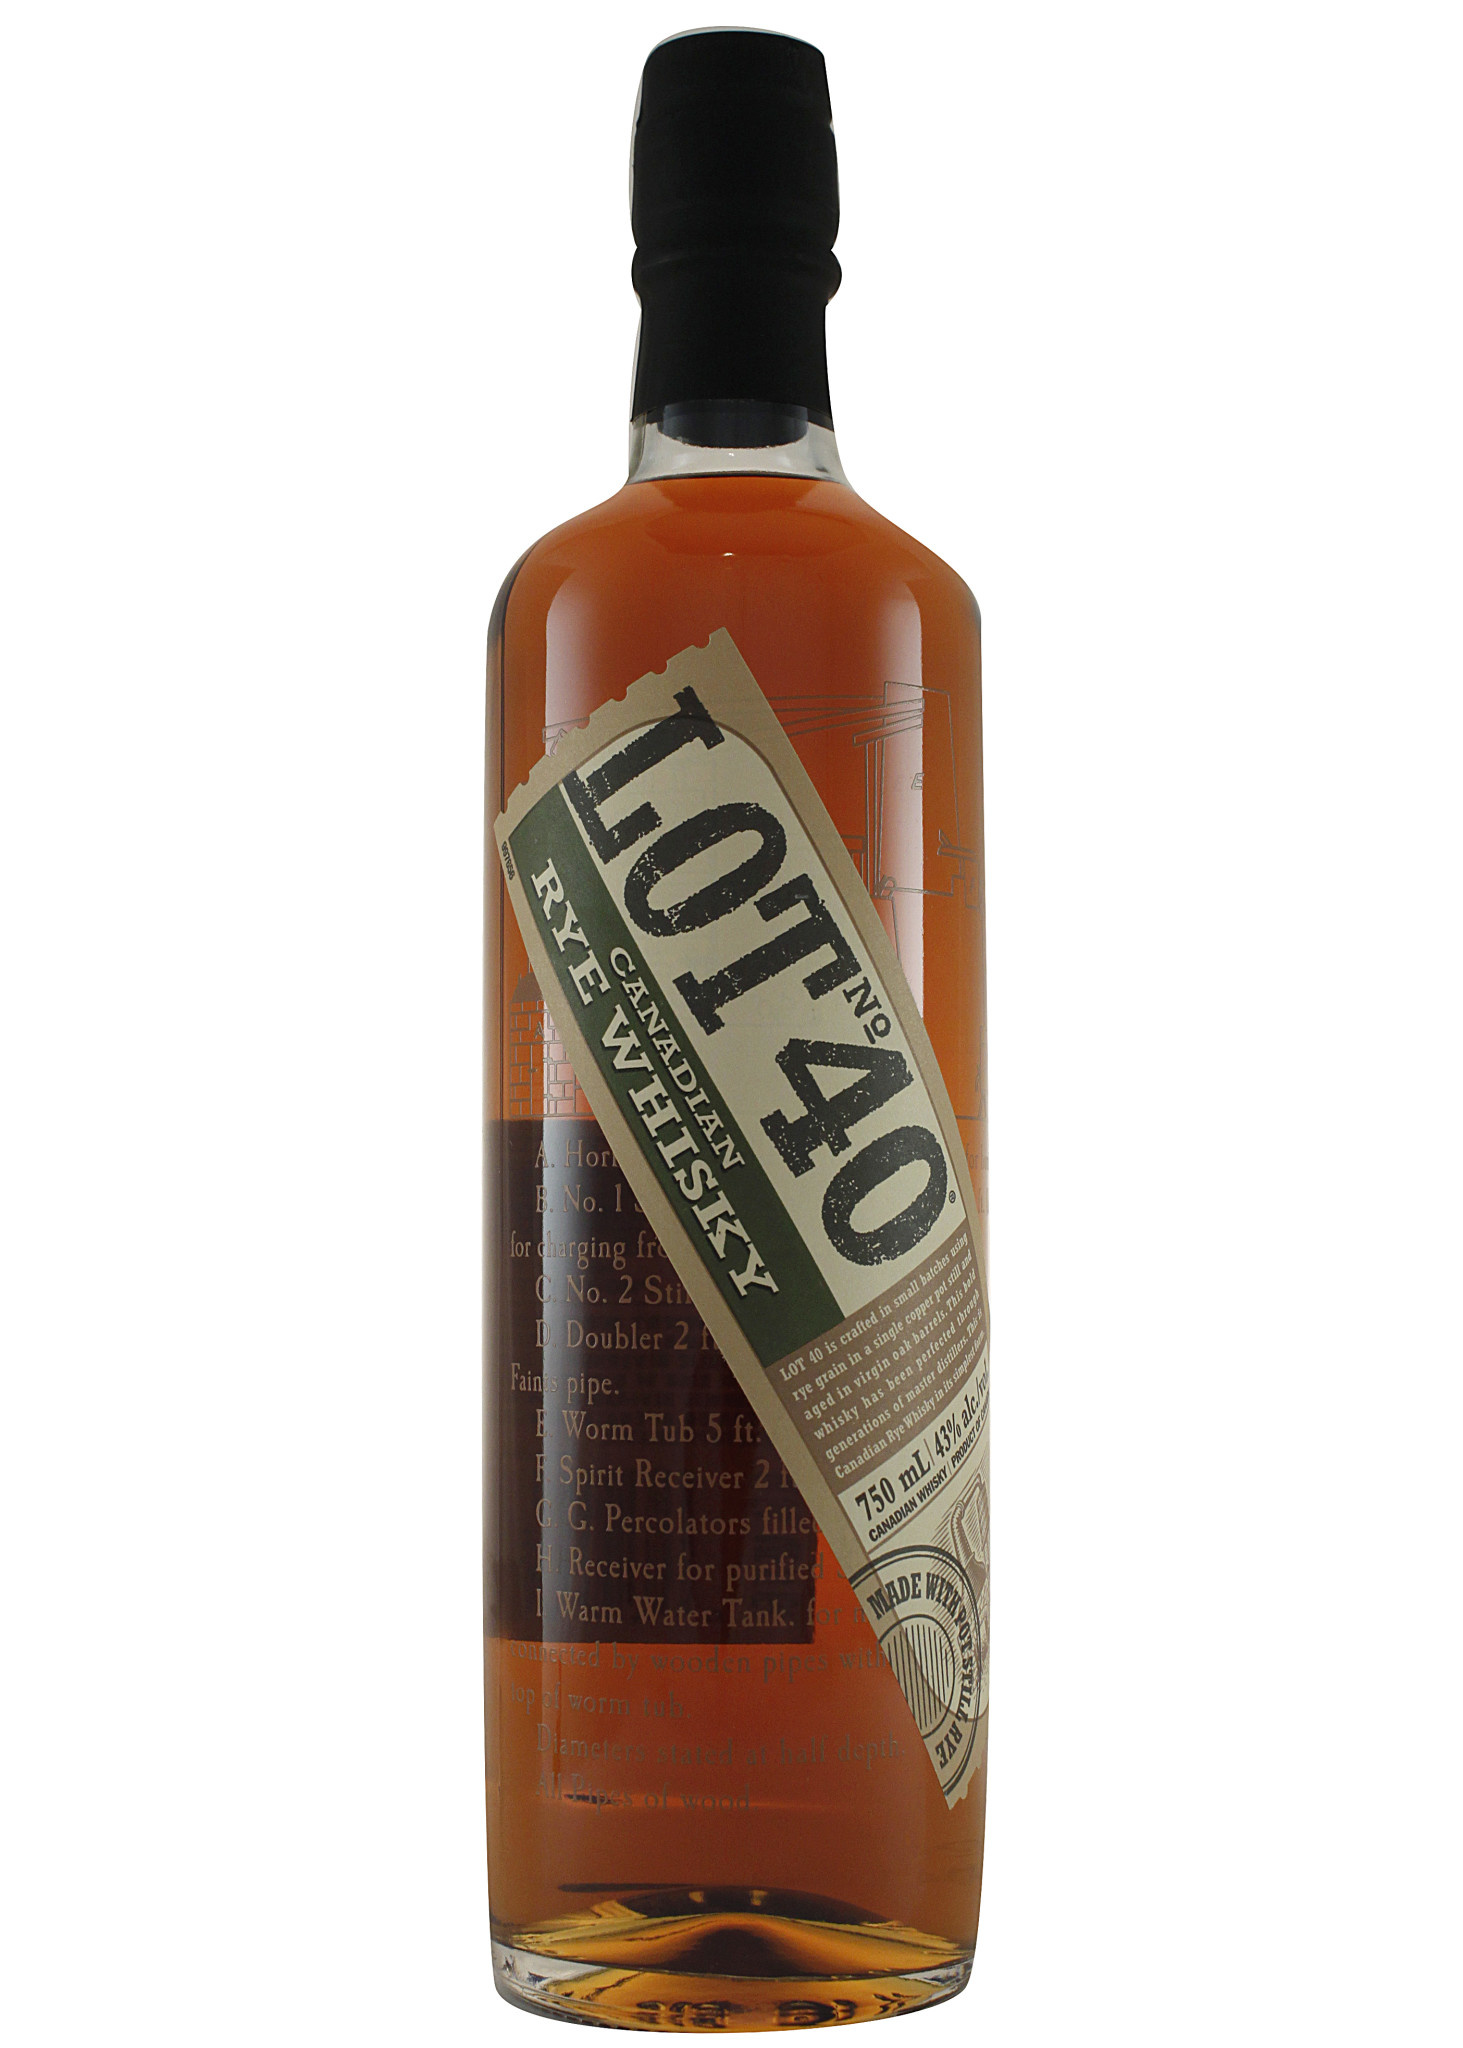 Lot No. 40 Canadian Rye Whisky, Windsor, Ontario